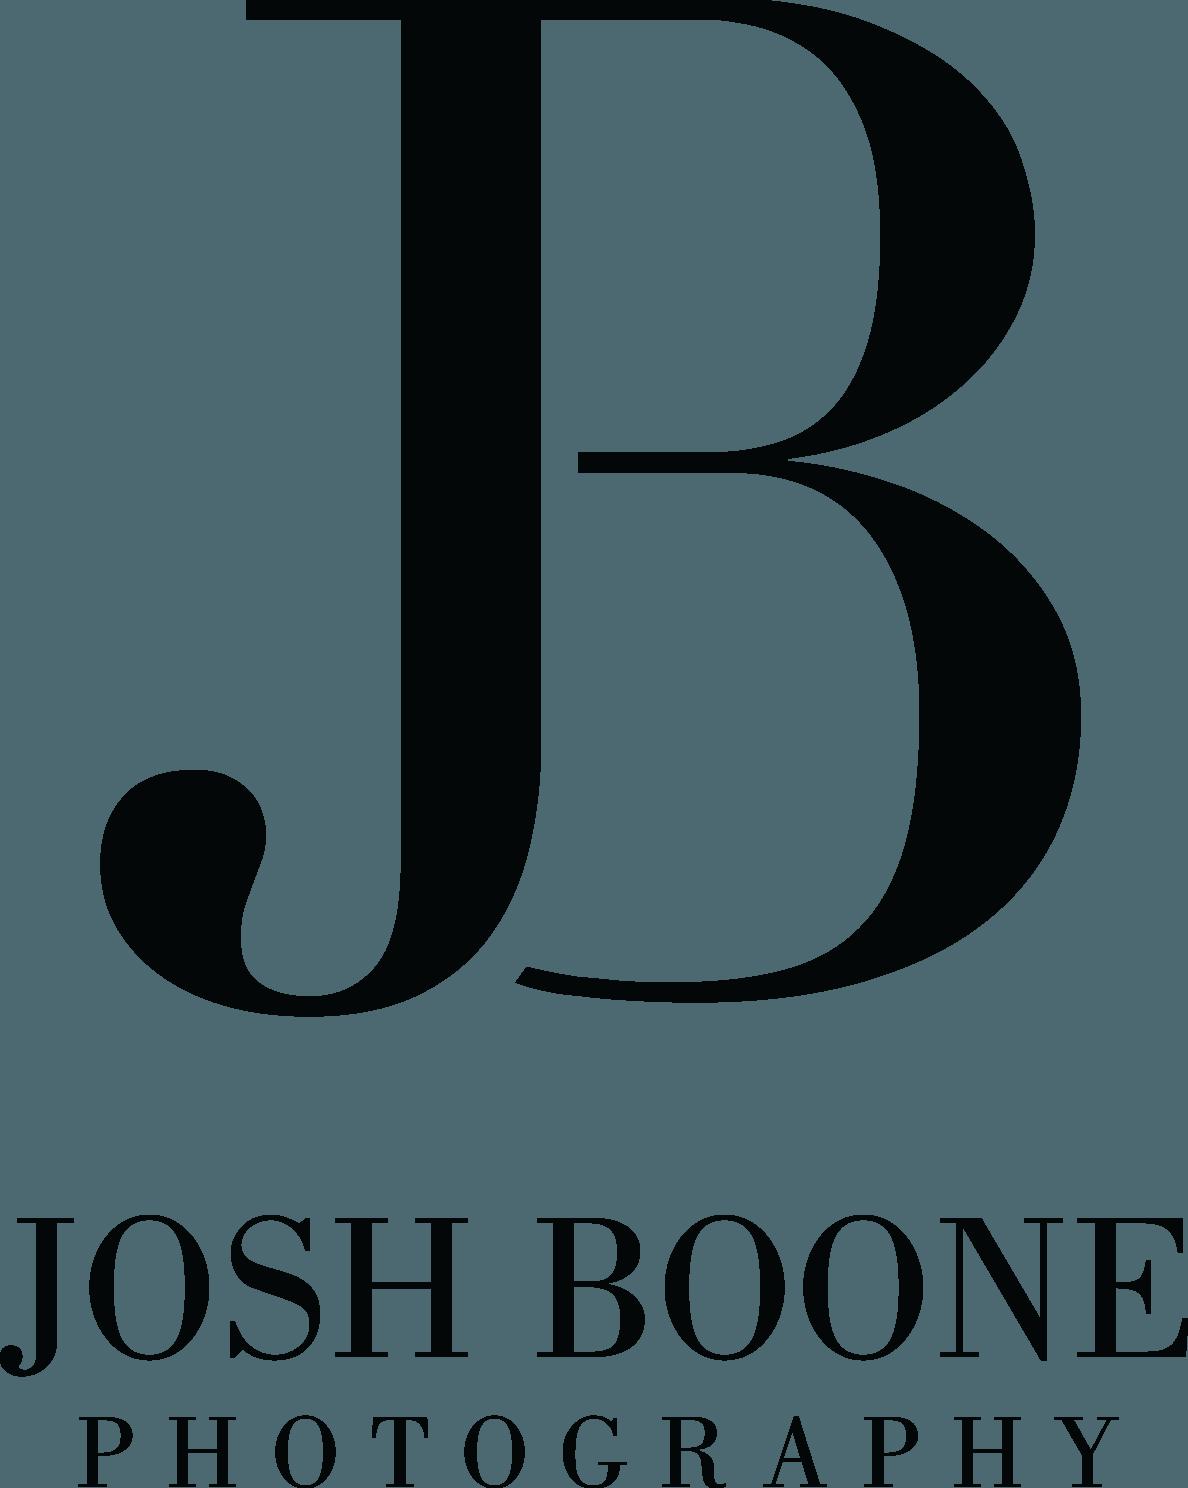 Josh Boone Photography